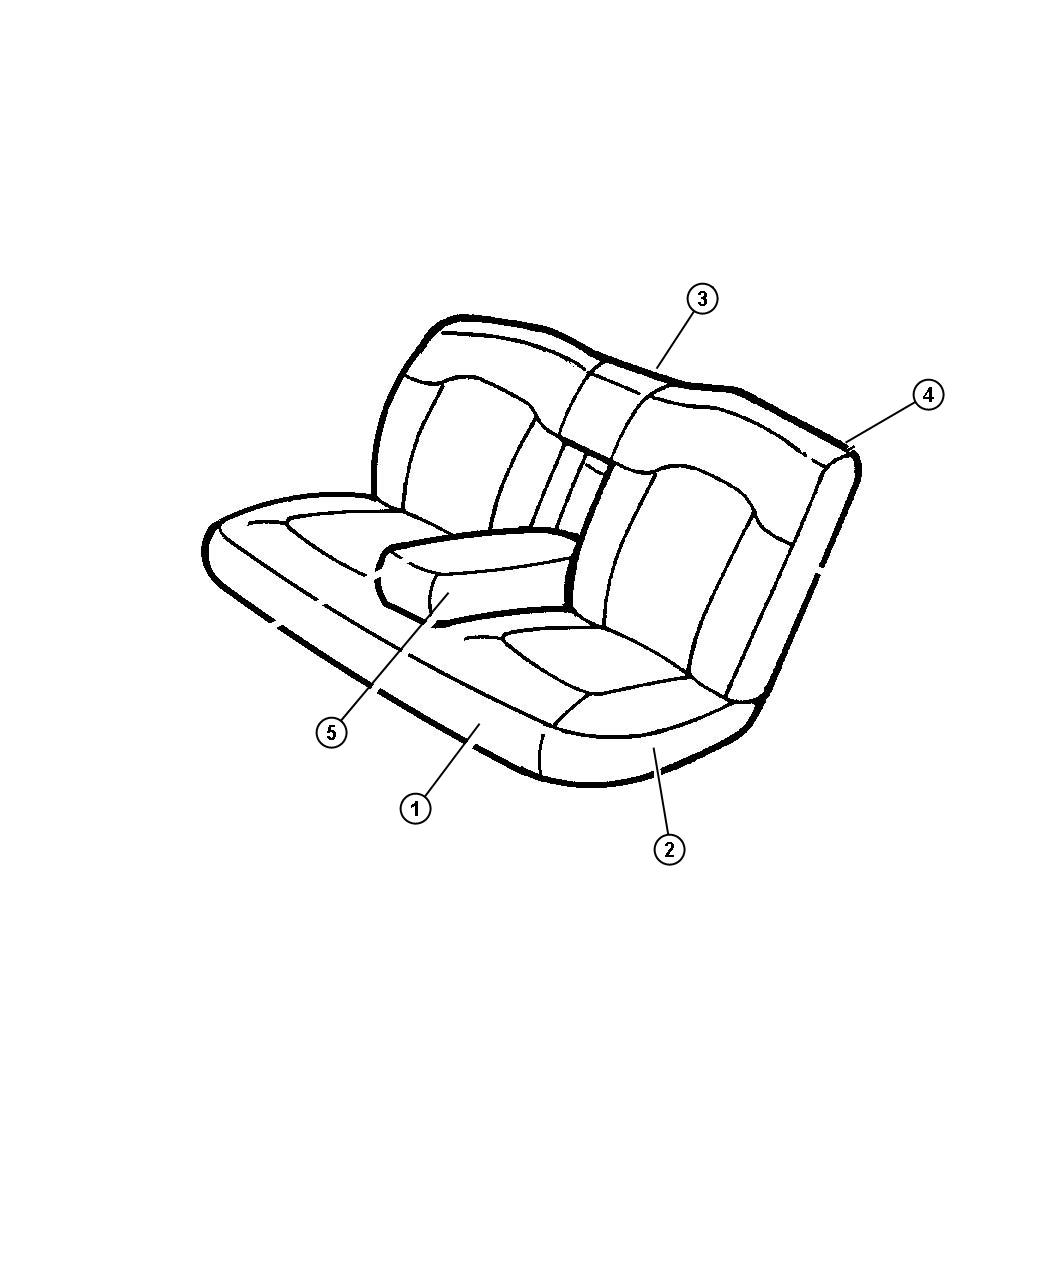 Chrysler Lhs Armrest Rear Seat Center L2 Trim Seats